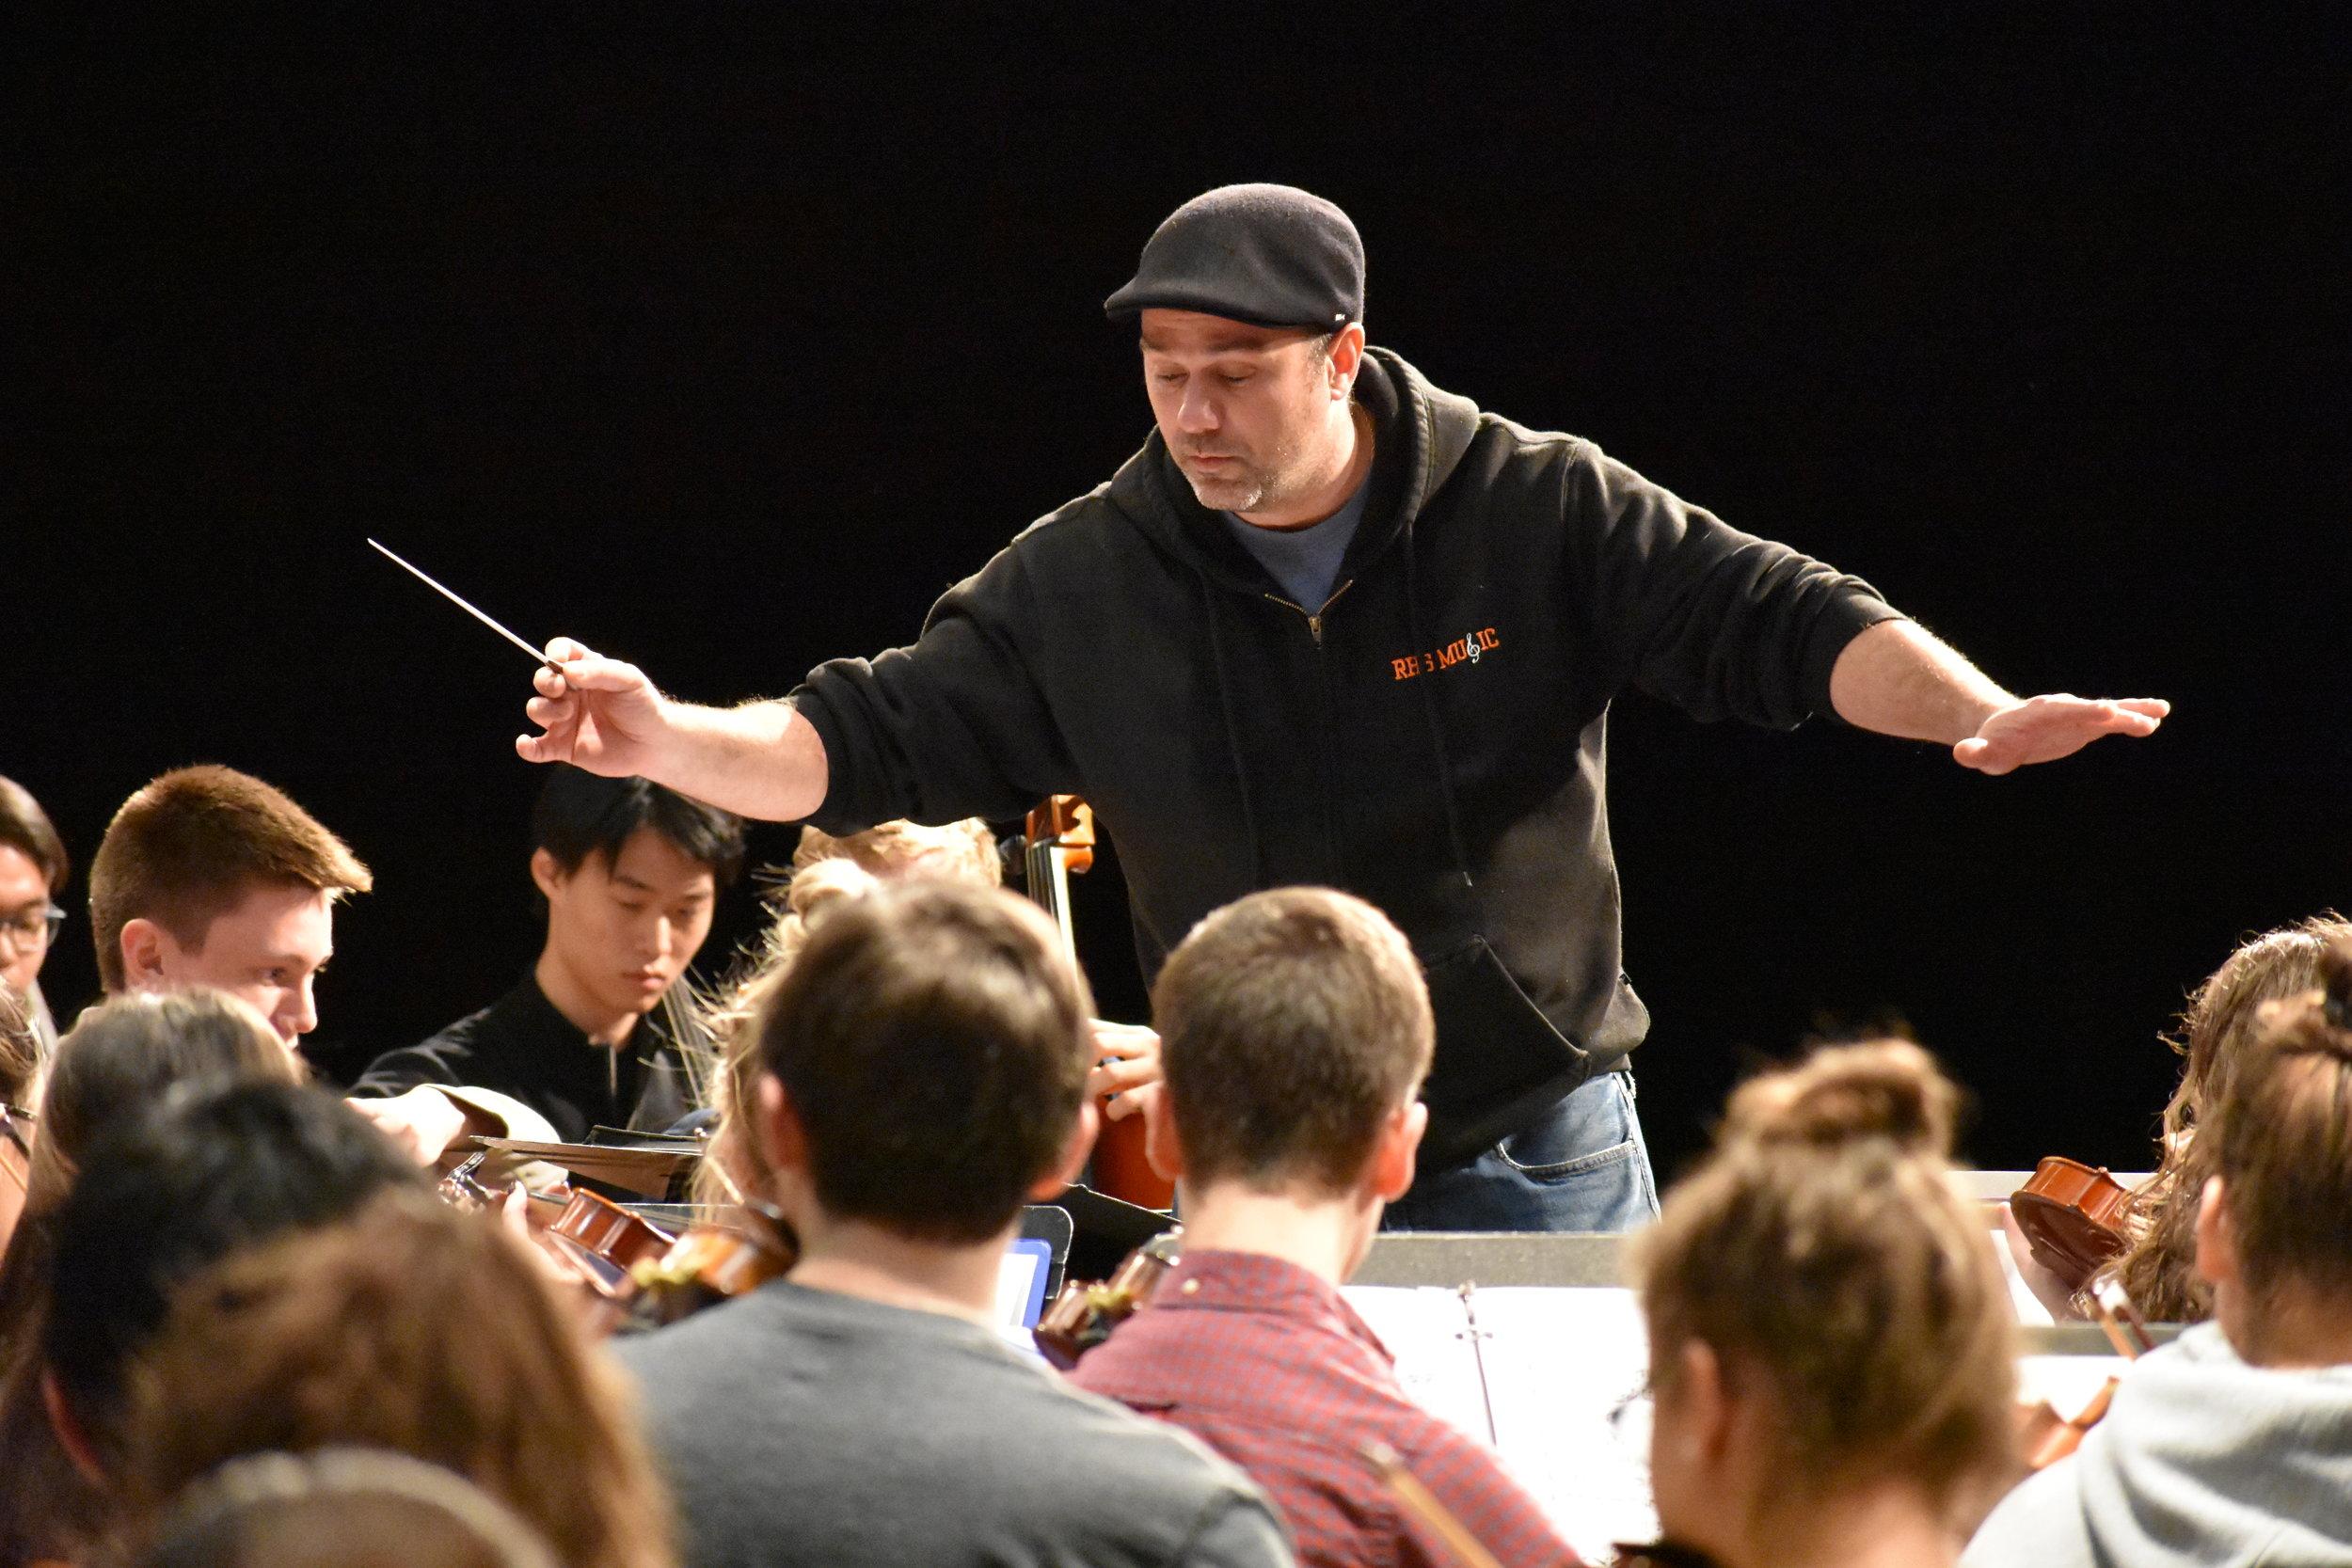 Michael McNamara, Orchestra Director, 2018